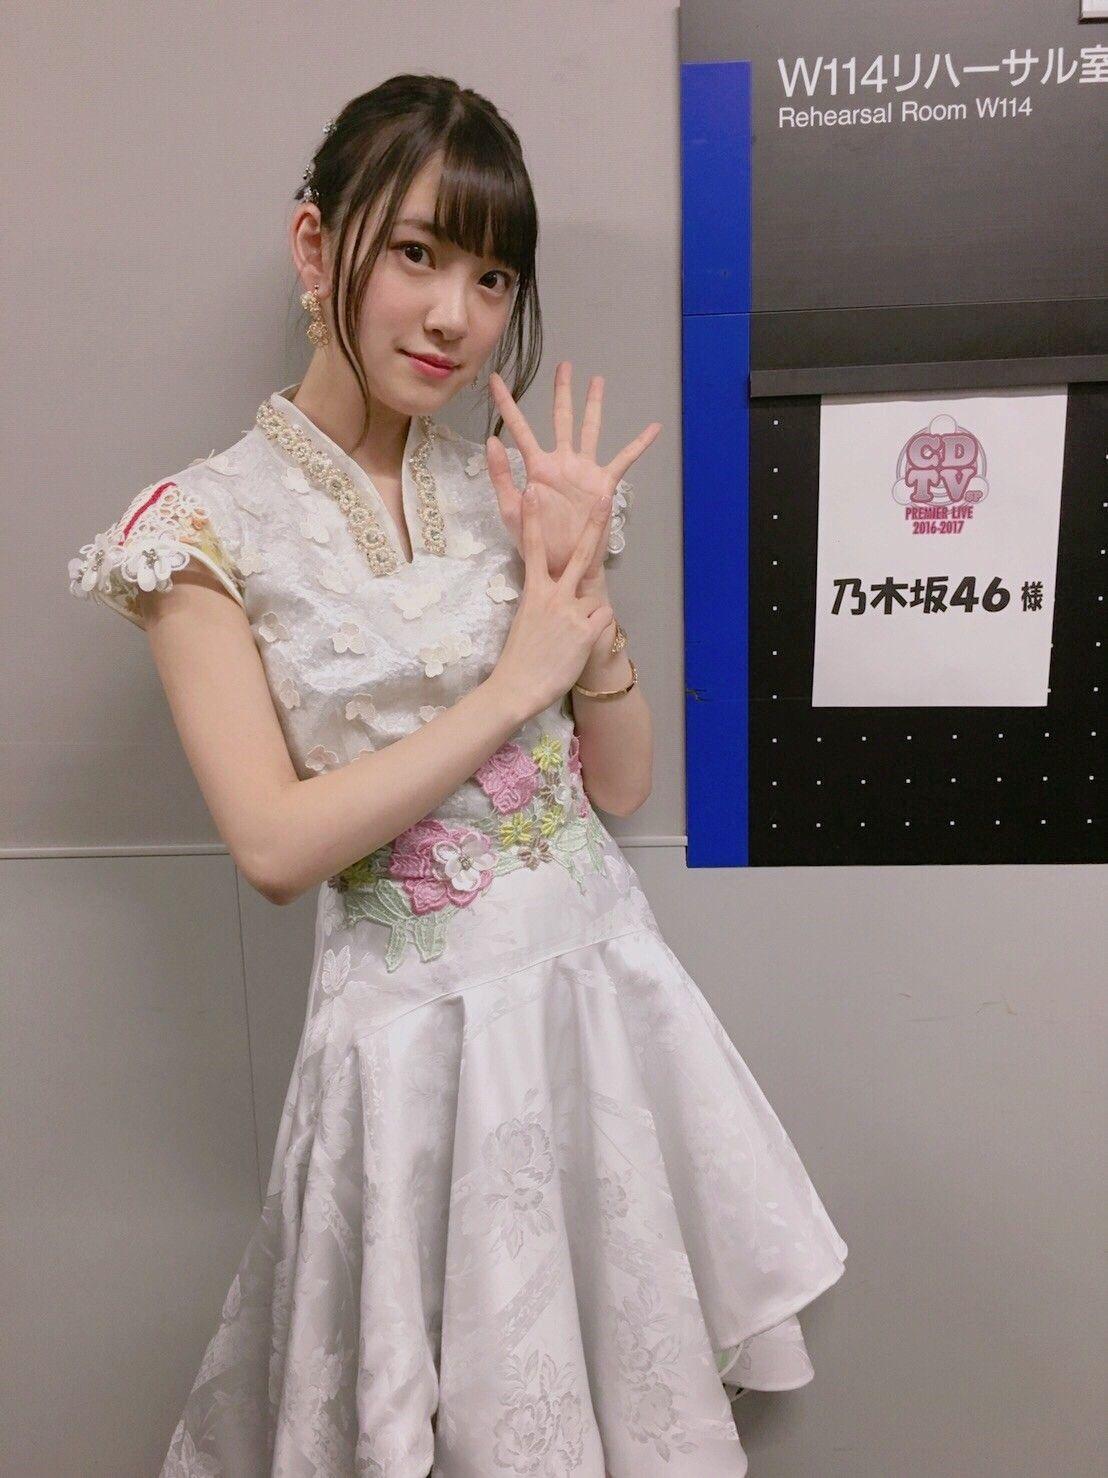 yic17: Miona blog 2016.12.24 ~ 2017.01.01 | 日々是遊楽也